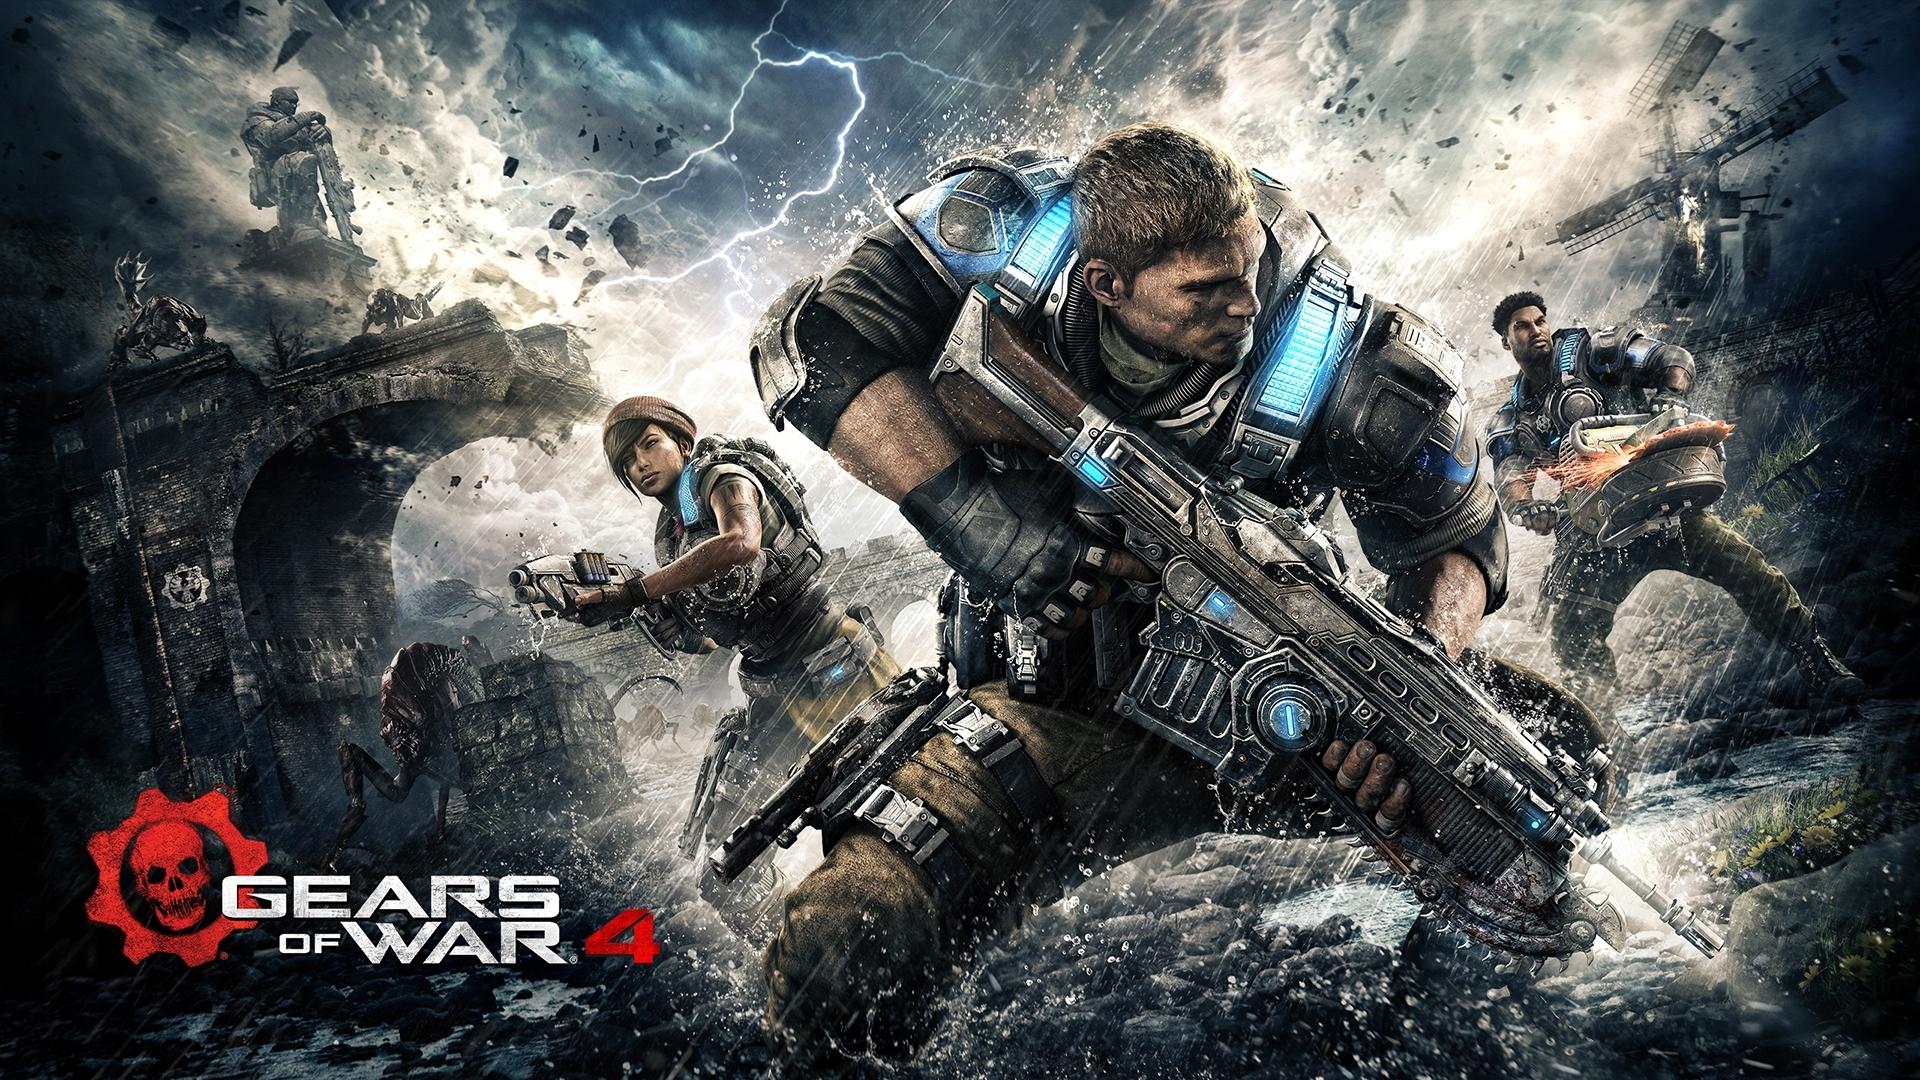 gears of war 4 wallpaper | gears of war - official site | games